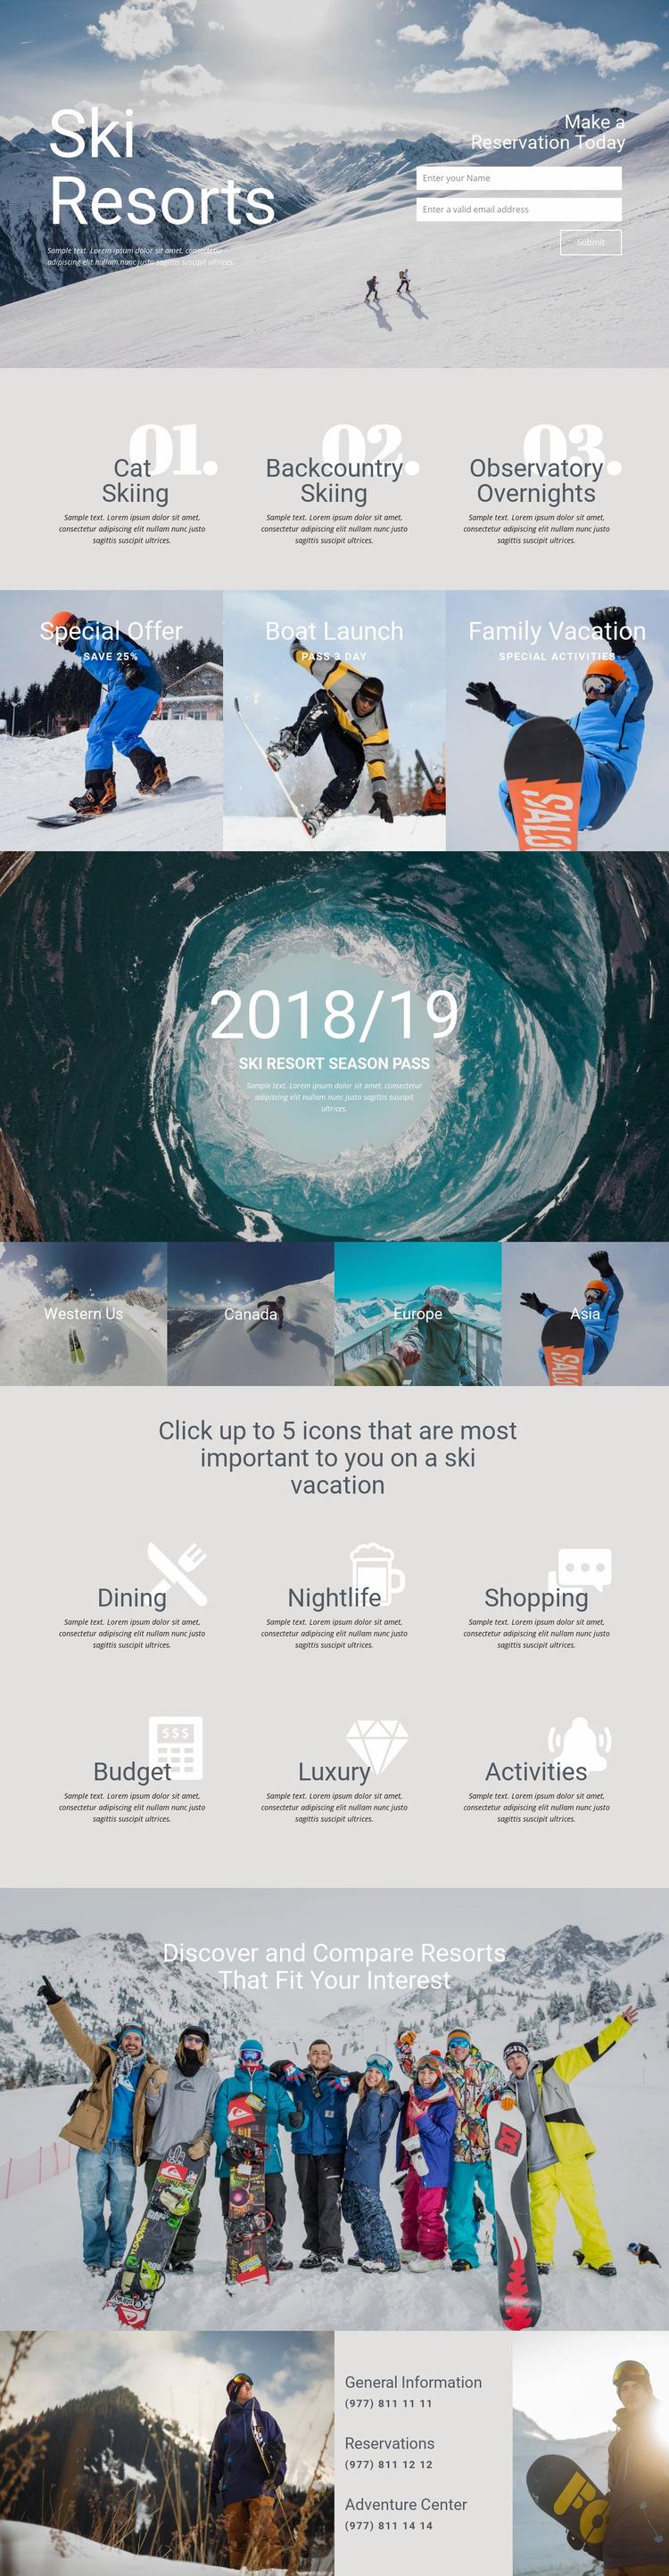 Ski Resorts Web Page Design